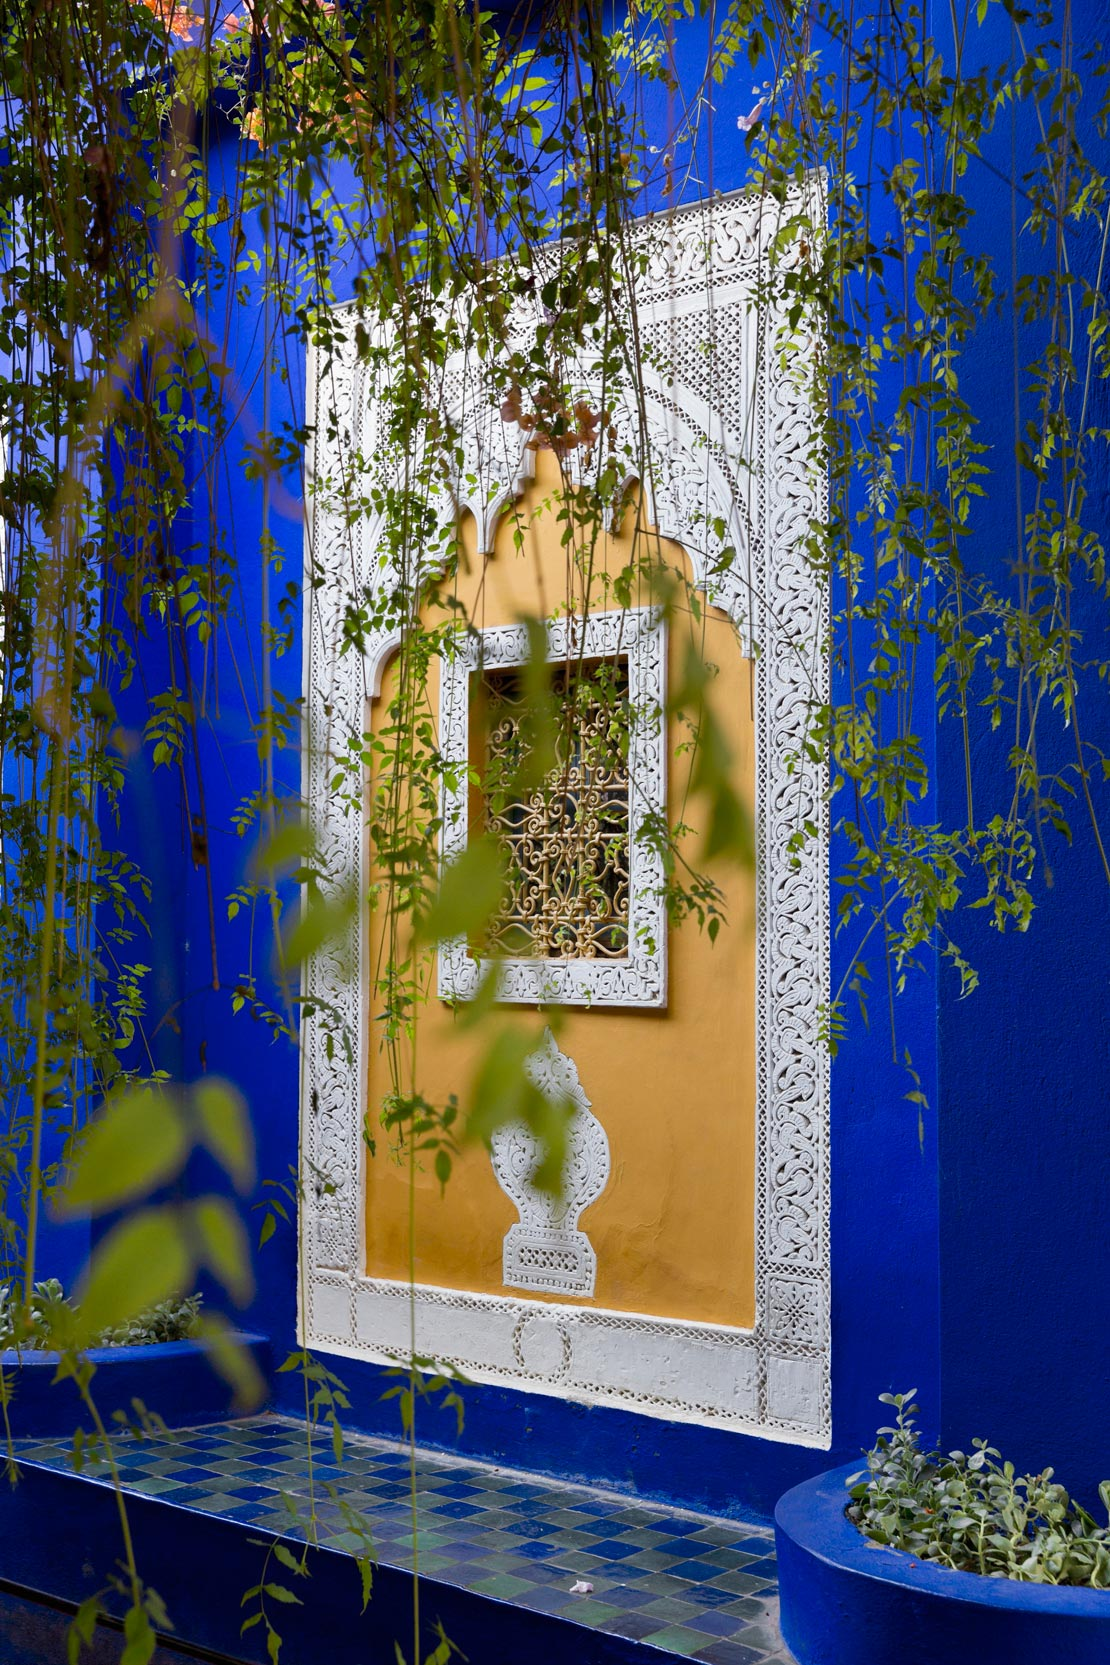 westwing-jardin-majorelle-fenster-blau-gelb